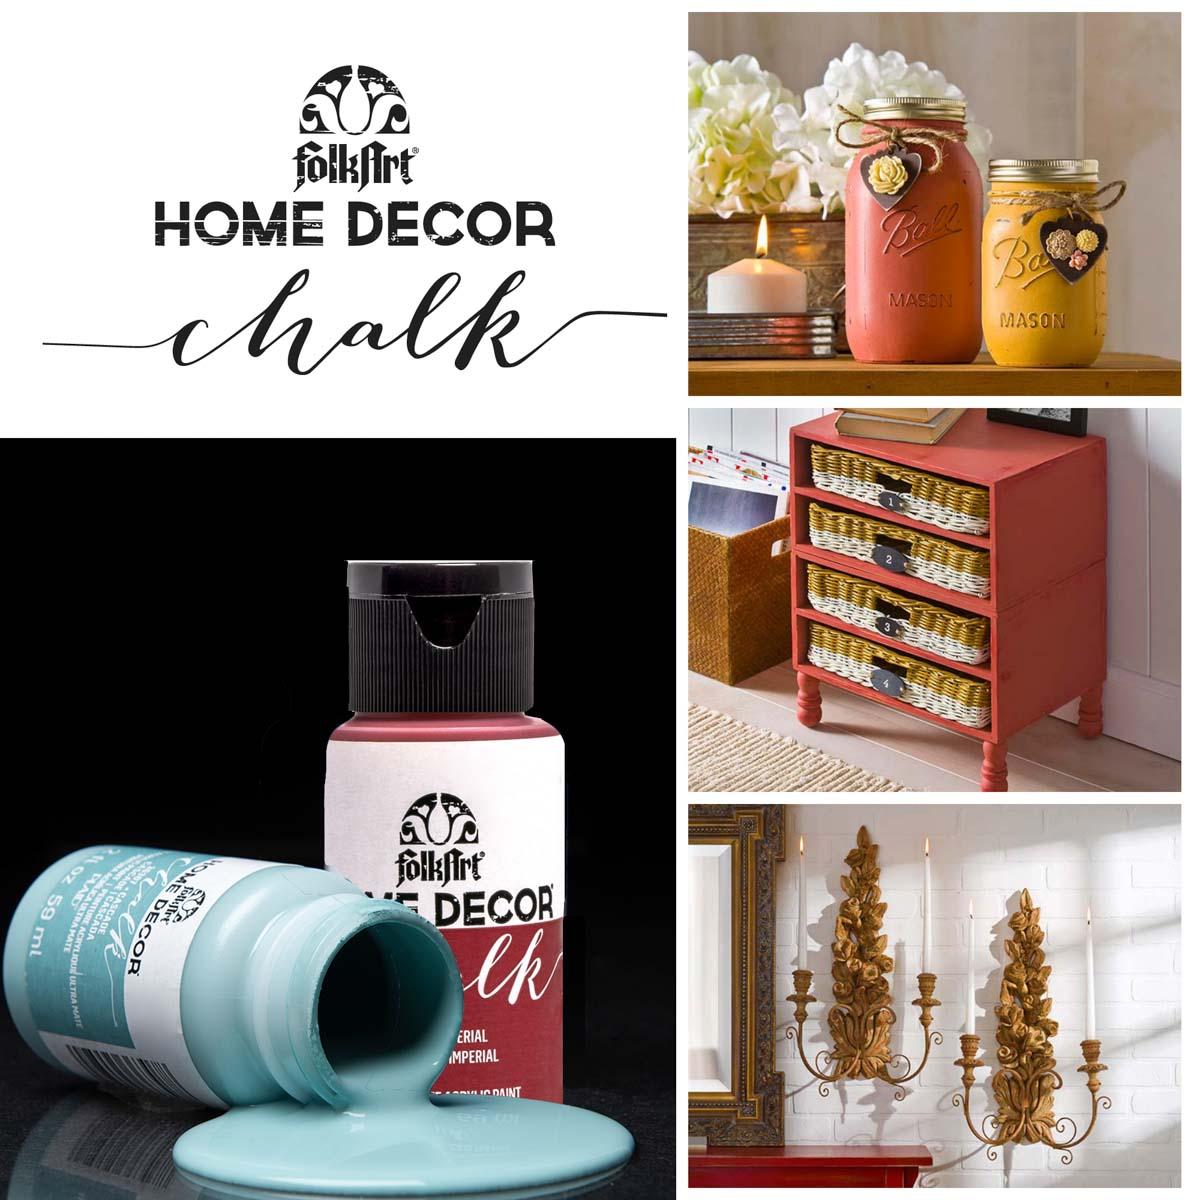 FolkArt Home Decor Chalk - Parisian Grey, 2 oz. - 36312